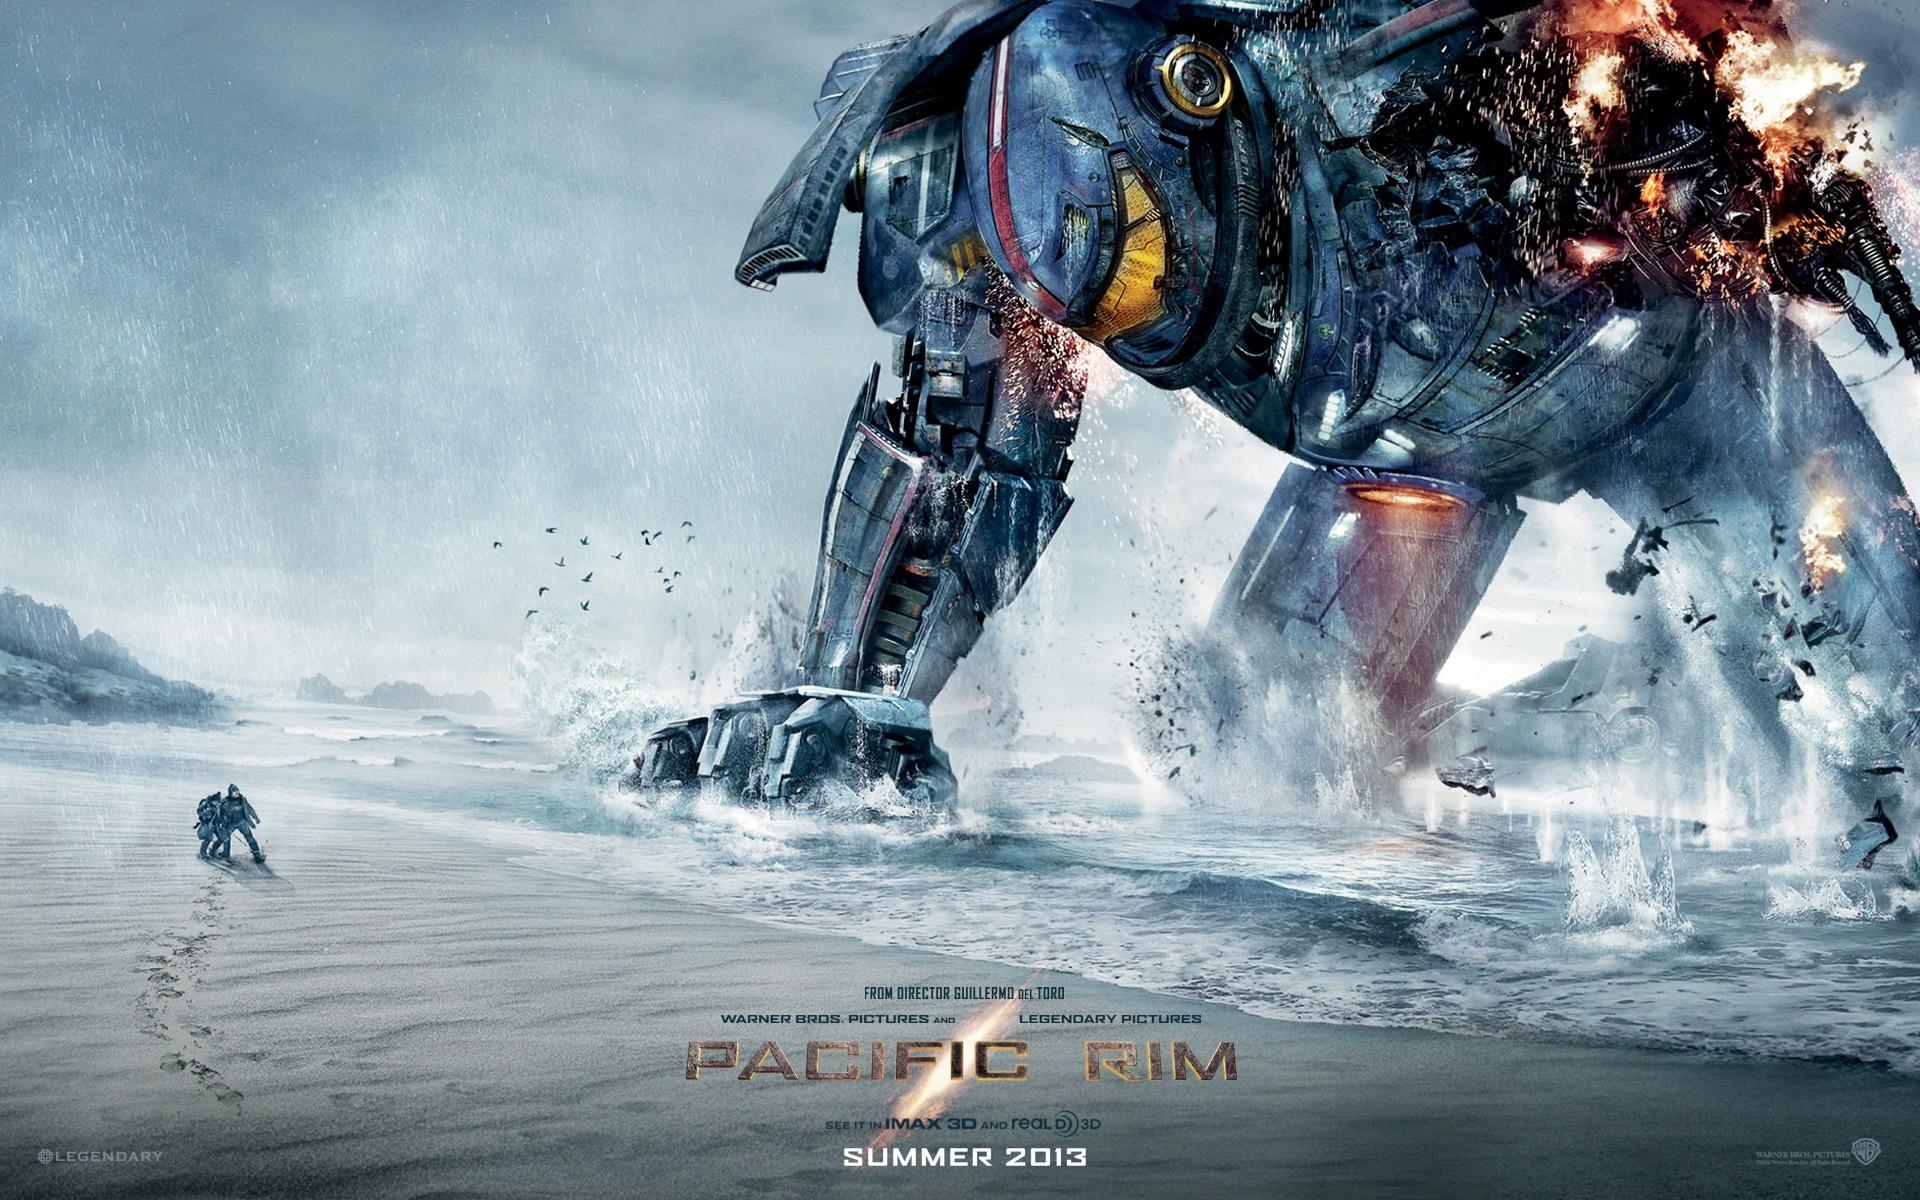 ws_Pacific_Rim_Poster_1920x1200